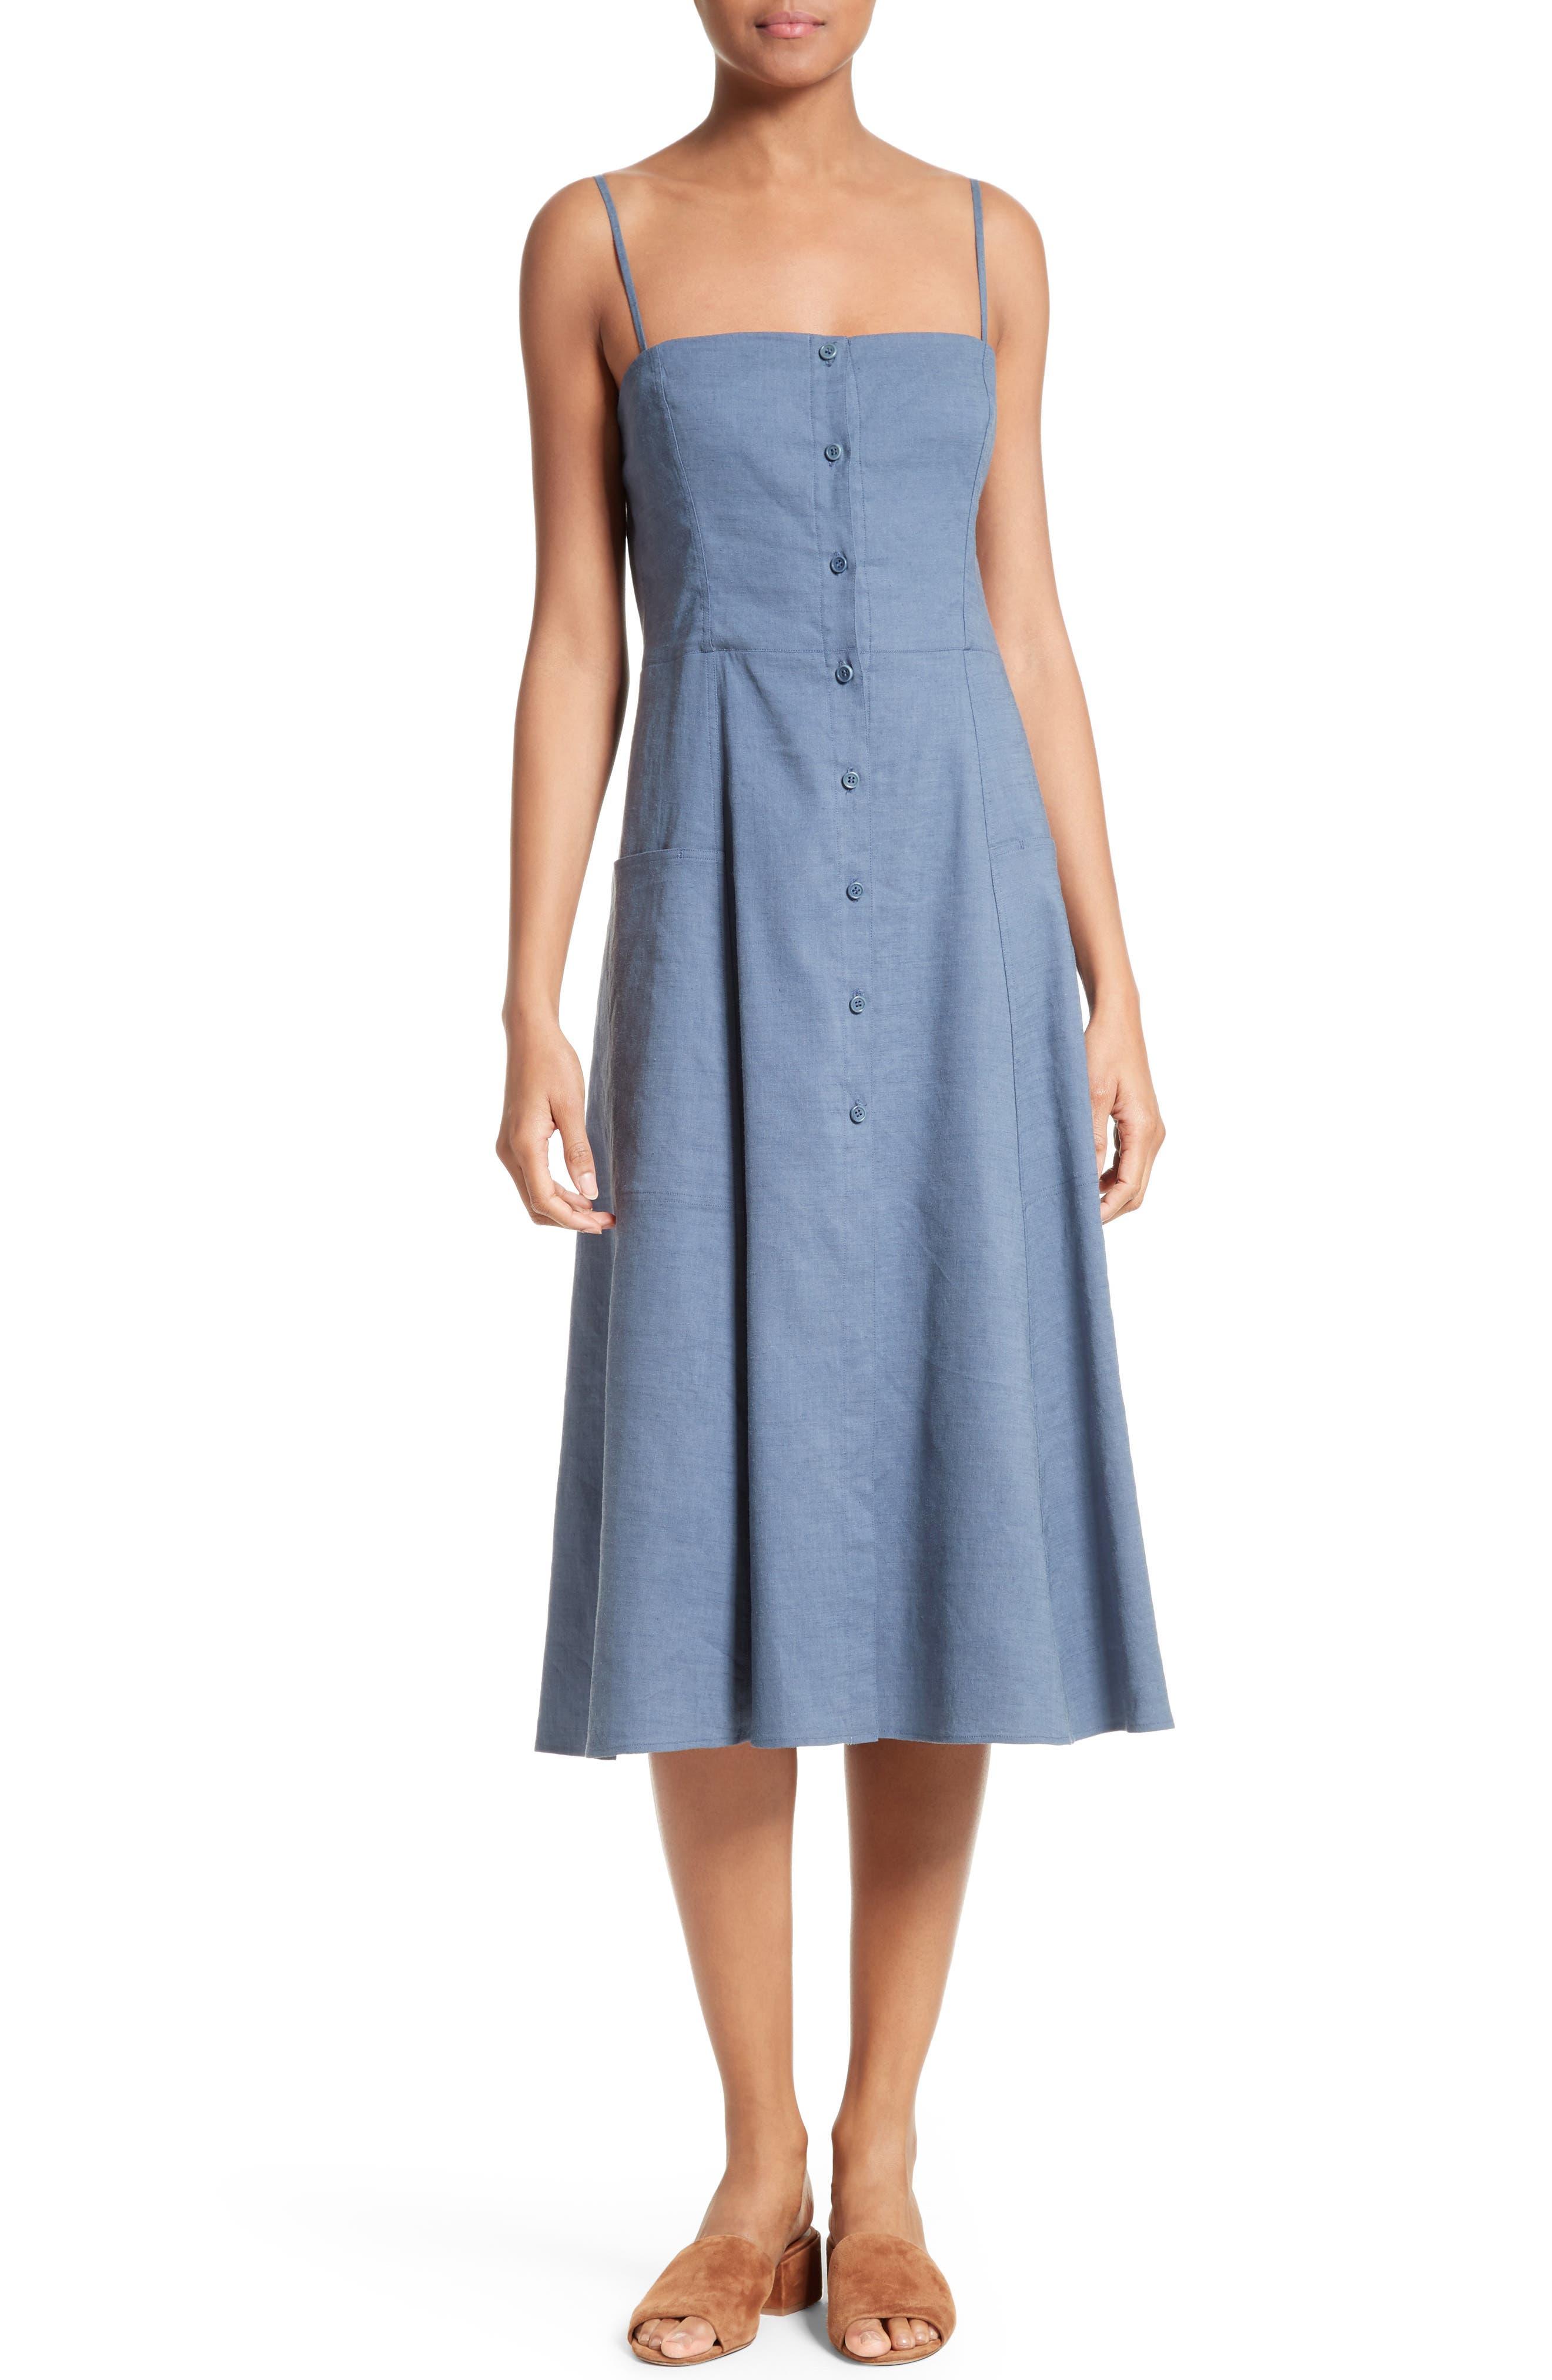 Alternate Image 1 Selected - Theory Kayleigh Crunch Wash Chambray Midi Dress